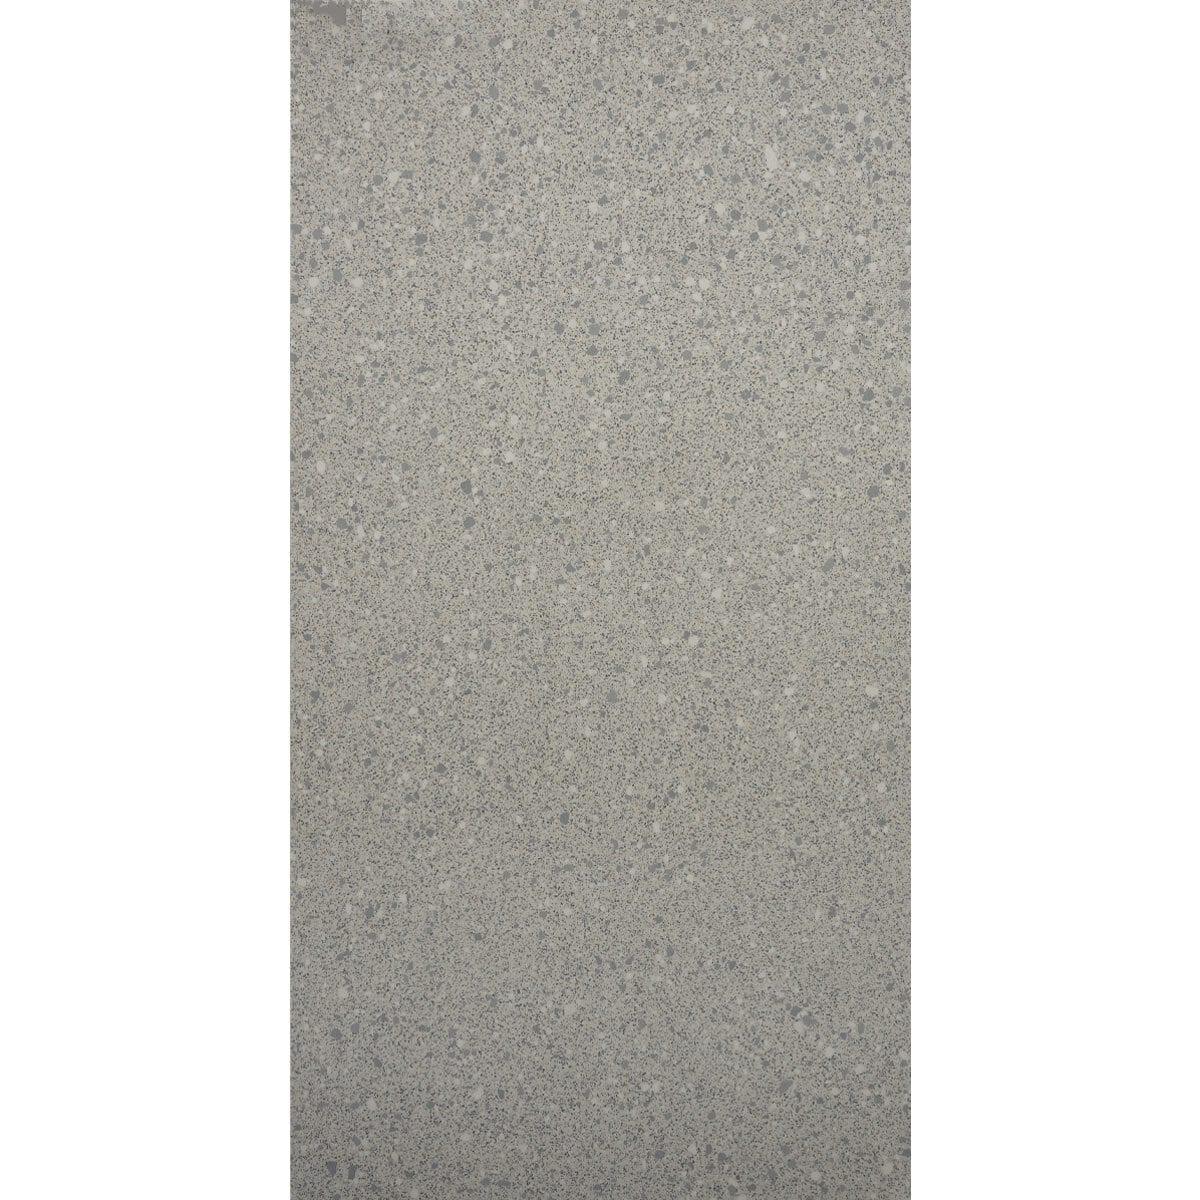 GRANULE GREY T10351 P1